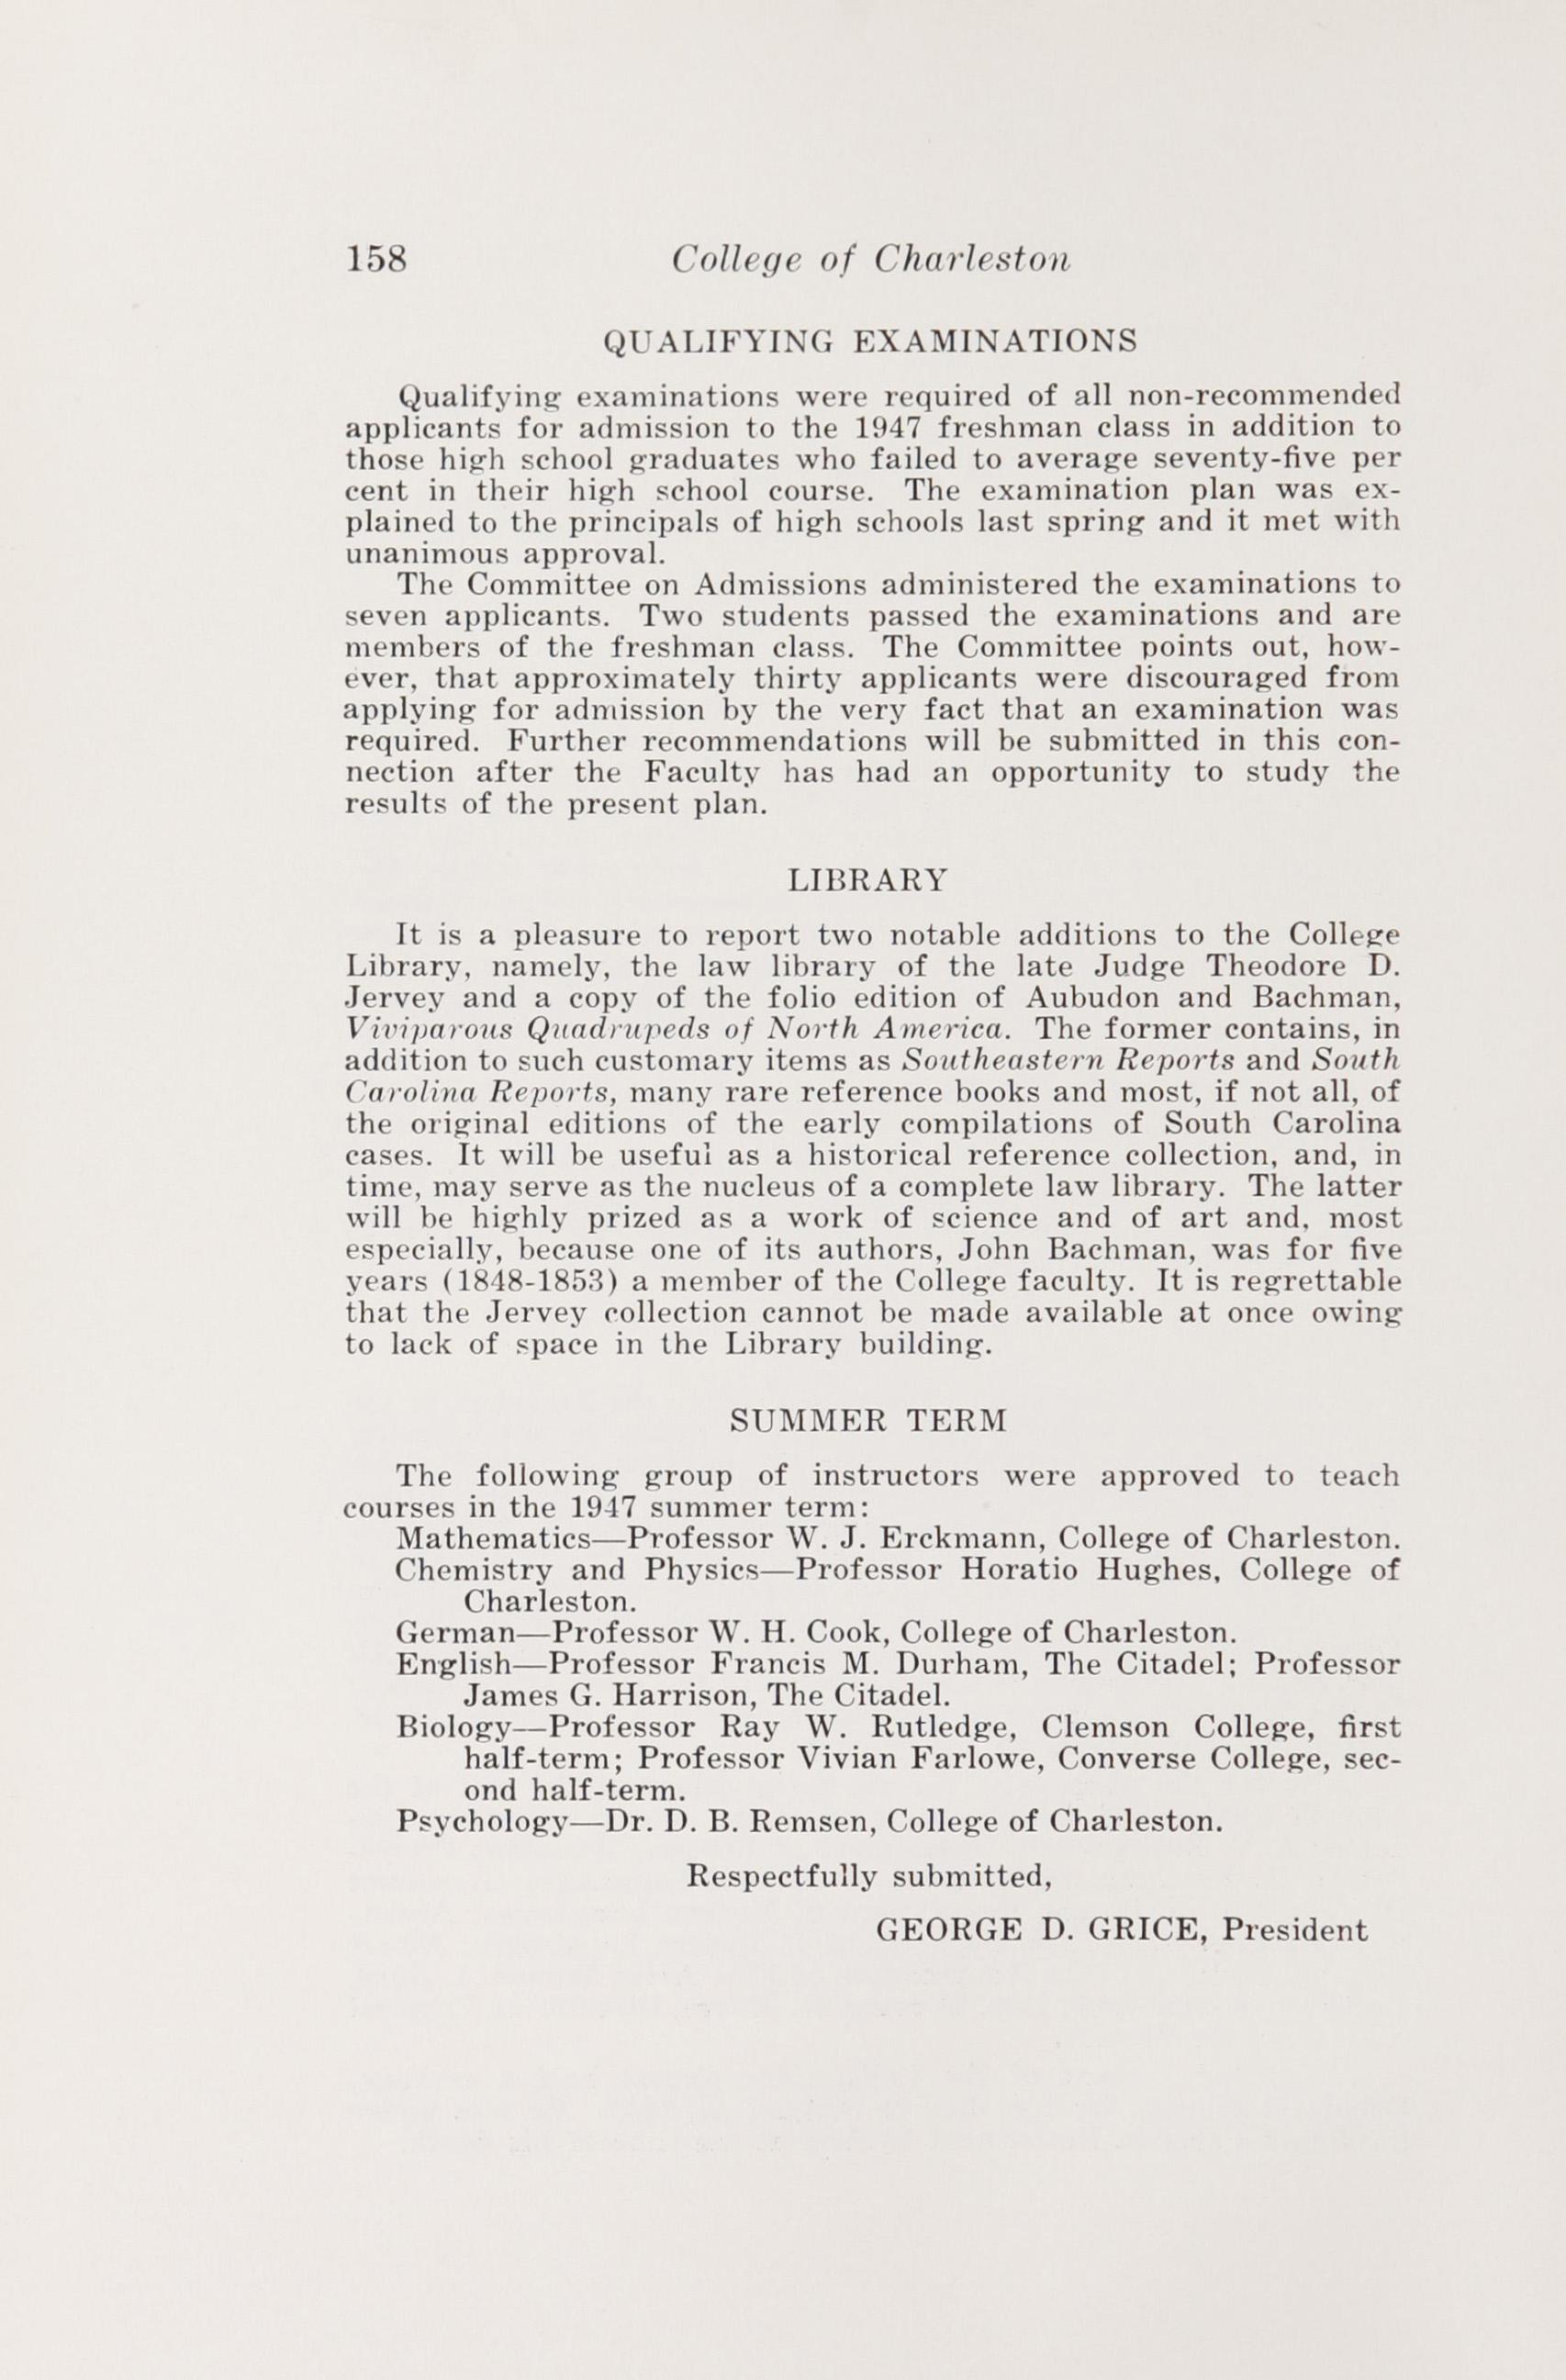 Charleston Yearbook, 1947, page 158